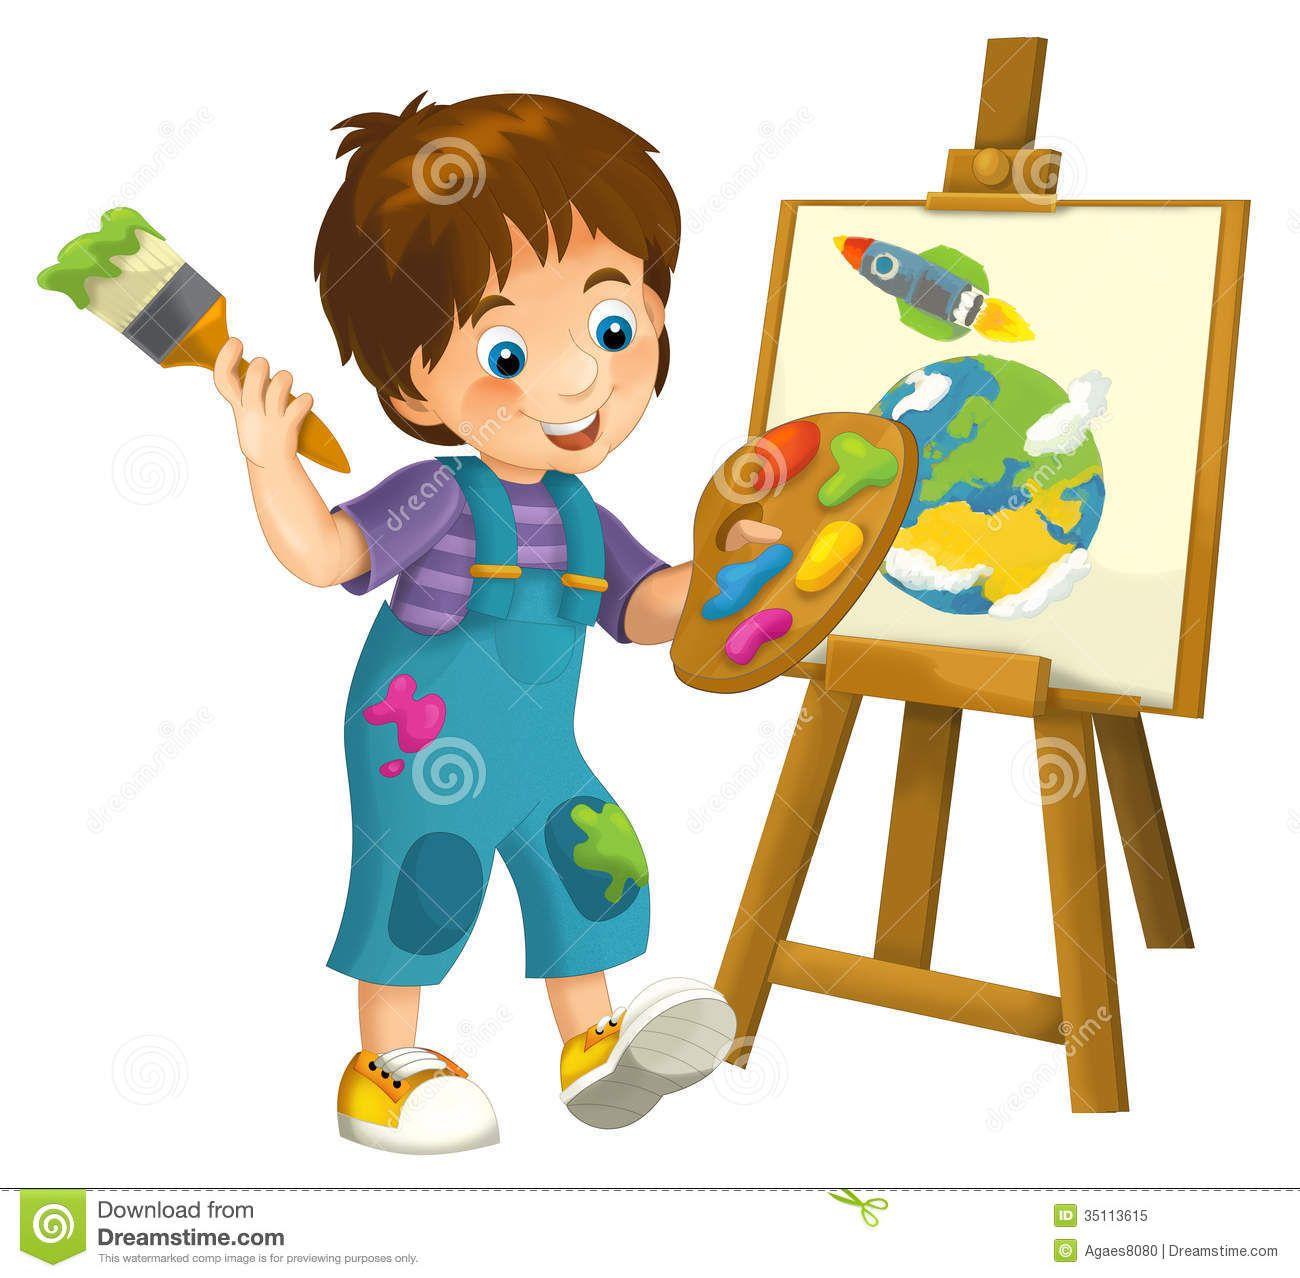 2d cartoons illustrations kids Free Stock Photo